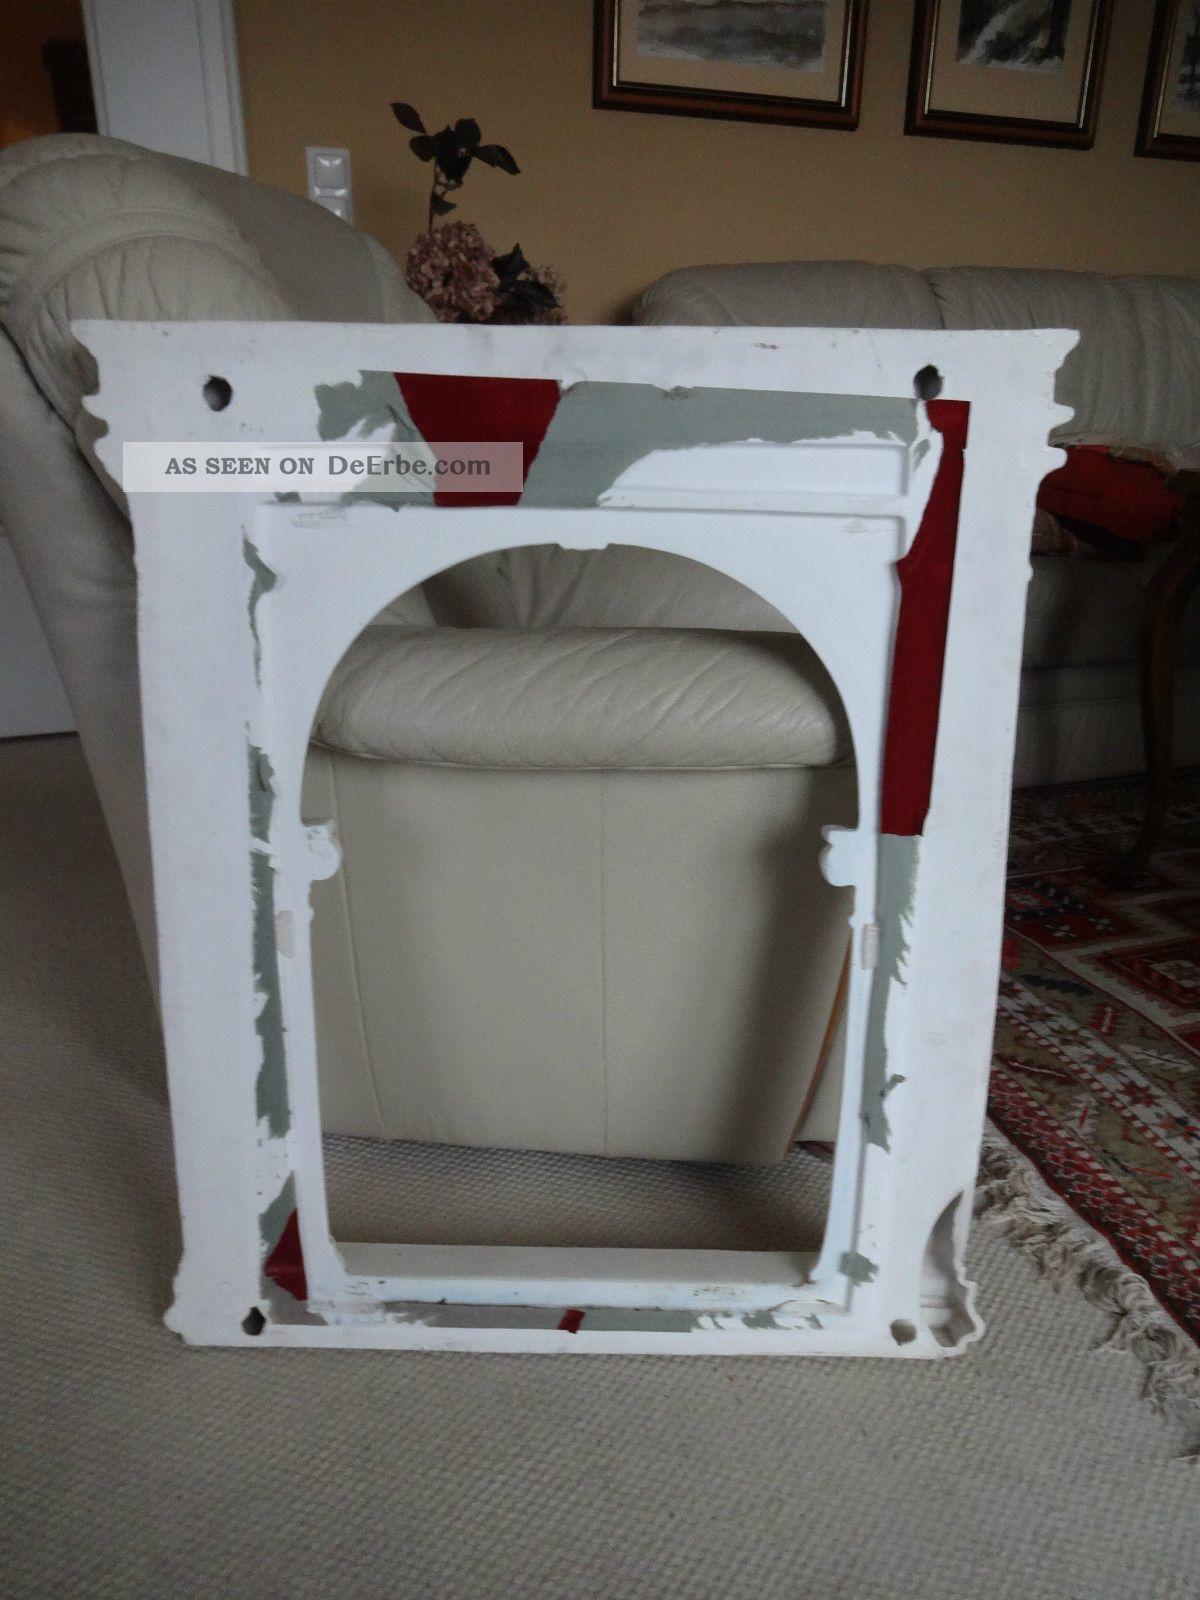 wandspiegel rechteckig weiss flurspiegel spiegel barock antik repro shabby. Black Bedroom Furniture Sets. Home Design Ideas